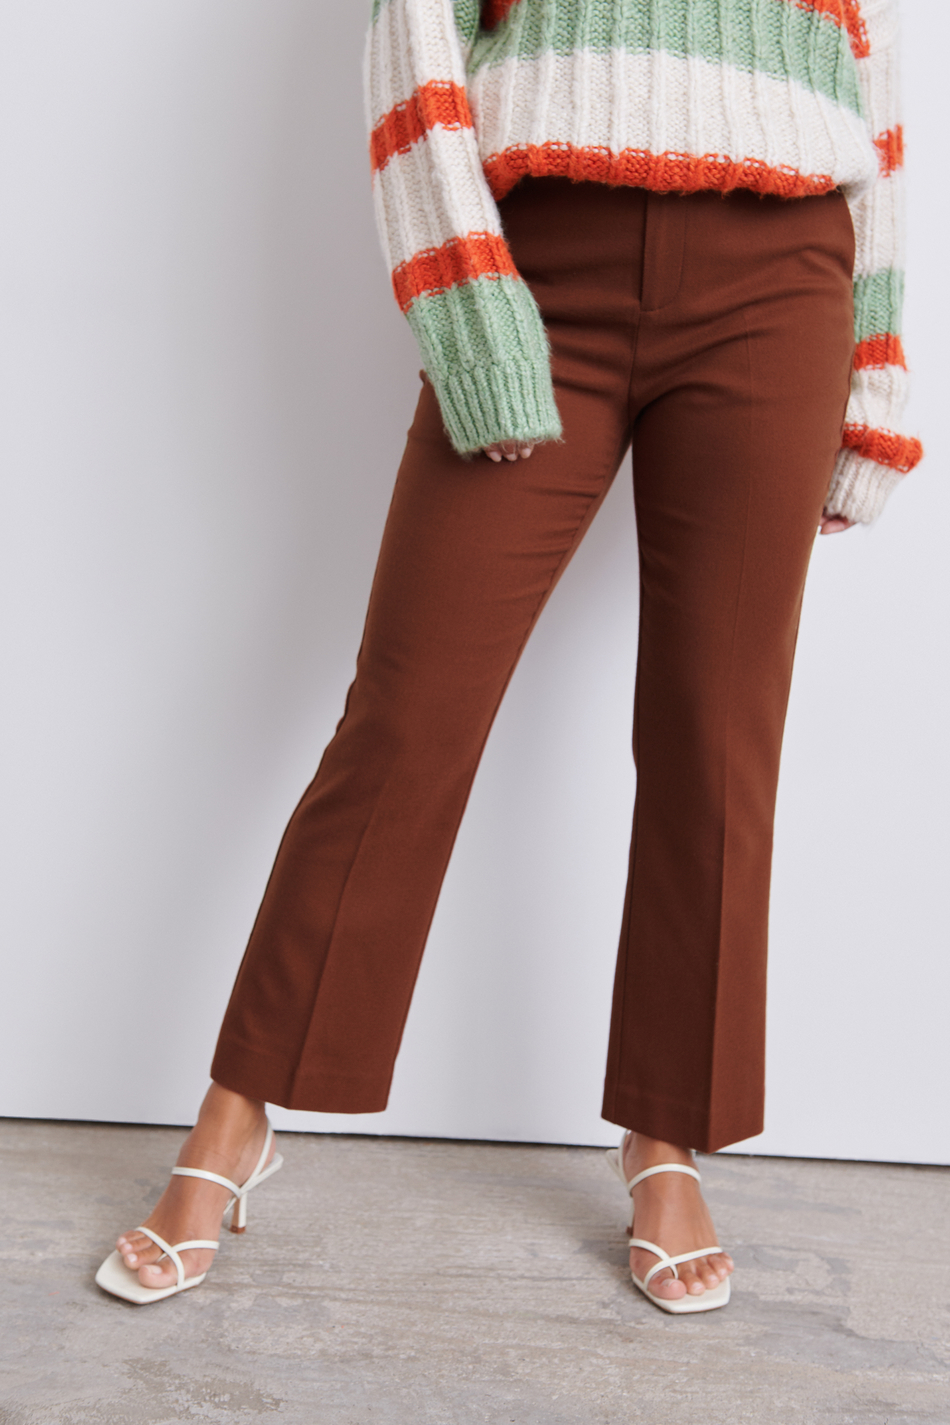 Lisa trousers 104.70 DKK, Habitbukser Tøj og mode online Gina Tricot